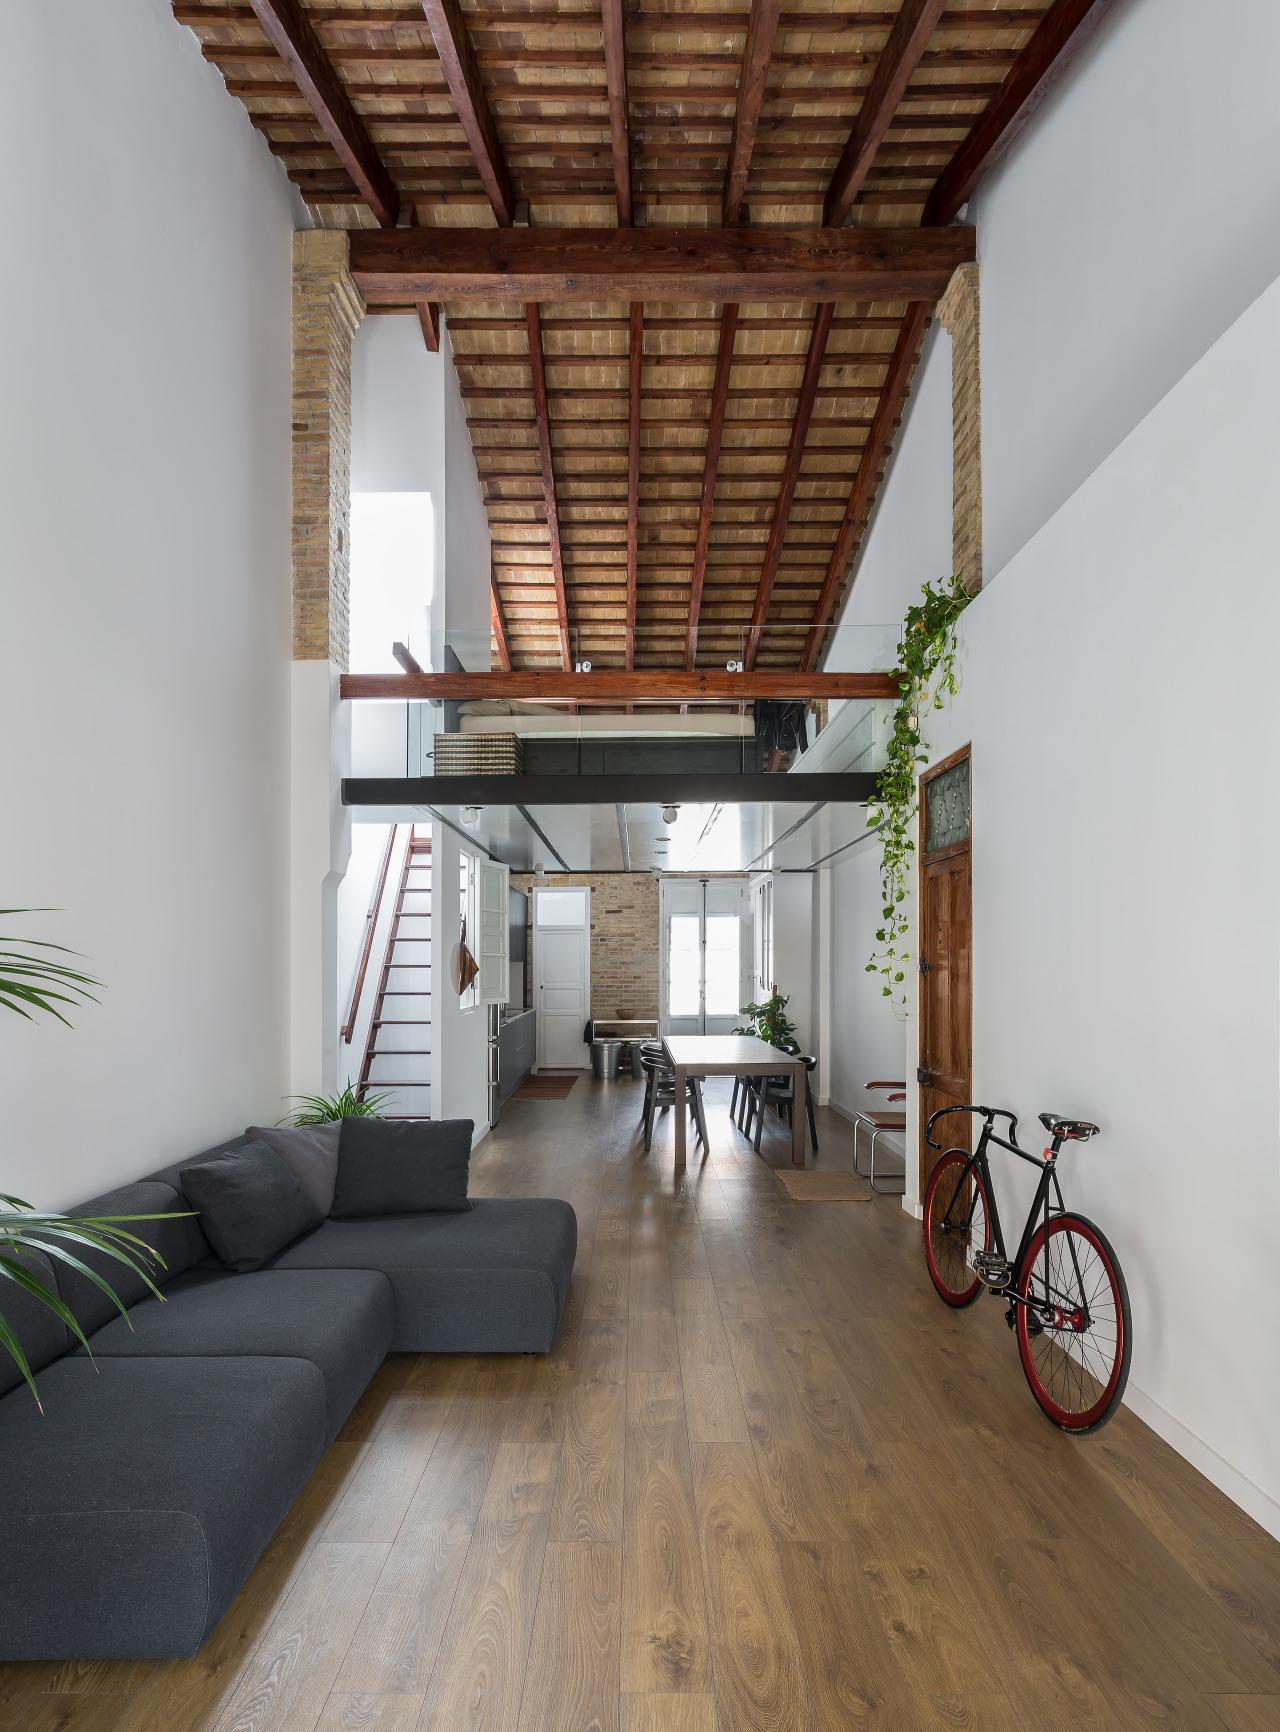 fotografia-arquitectura-valencia-german-cabo-ambau-cabanyal (5)